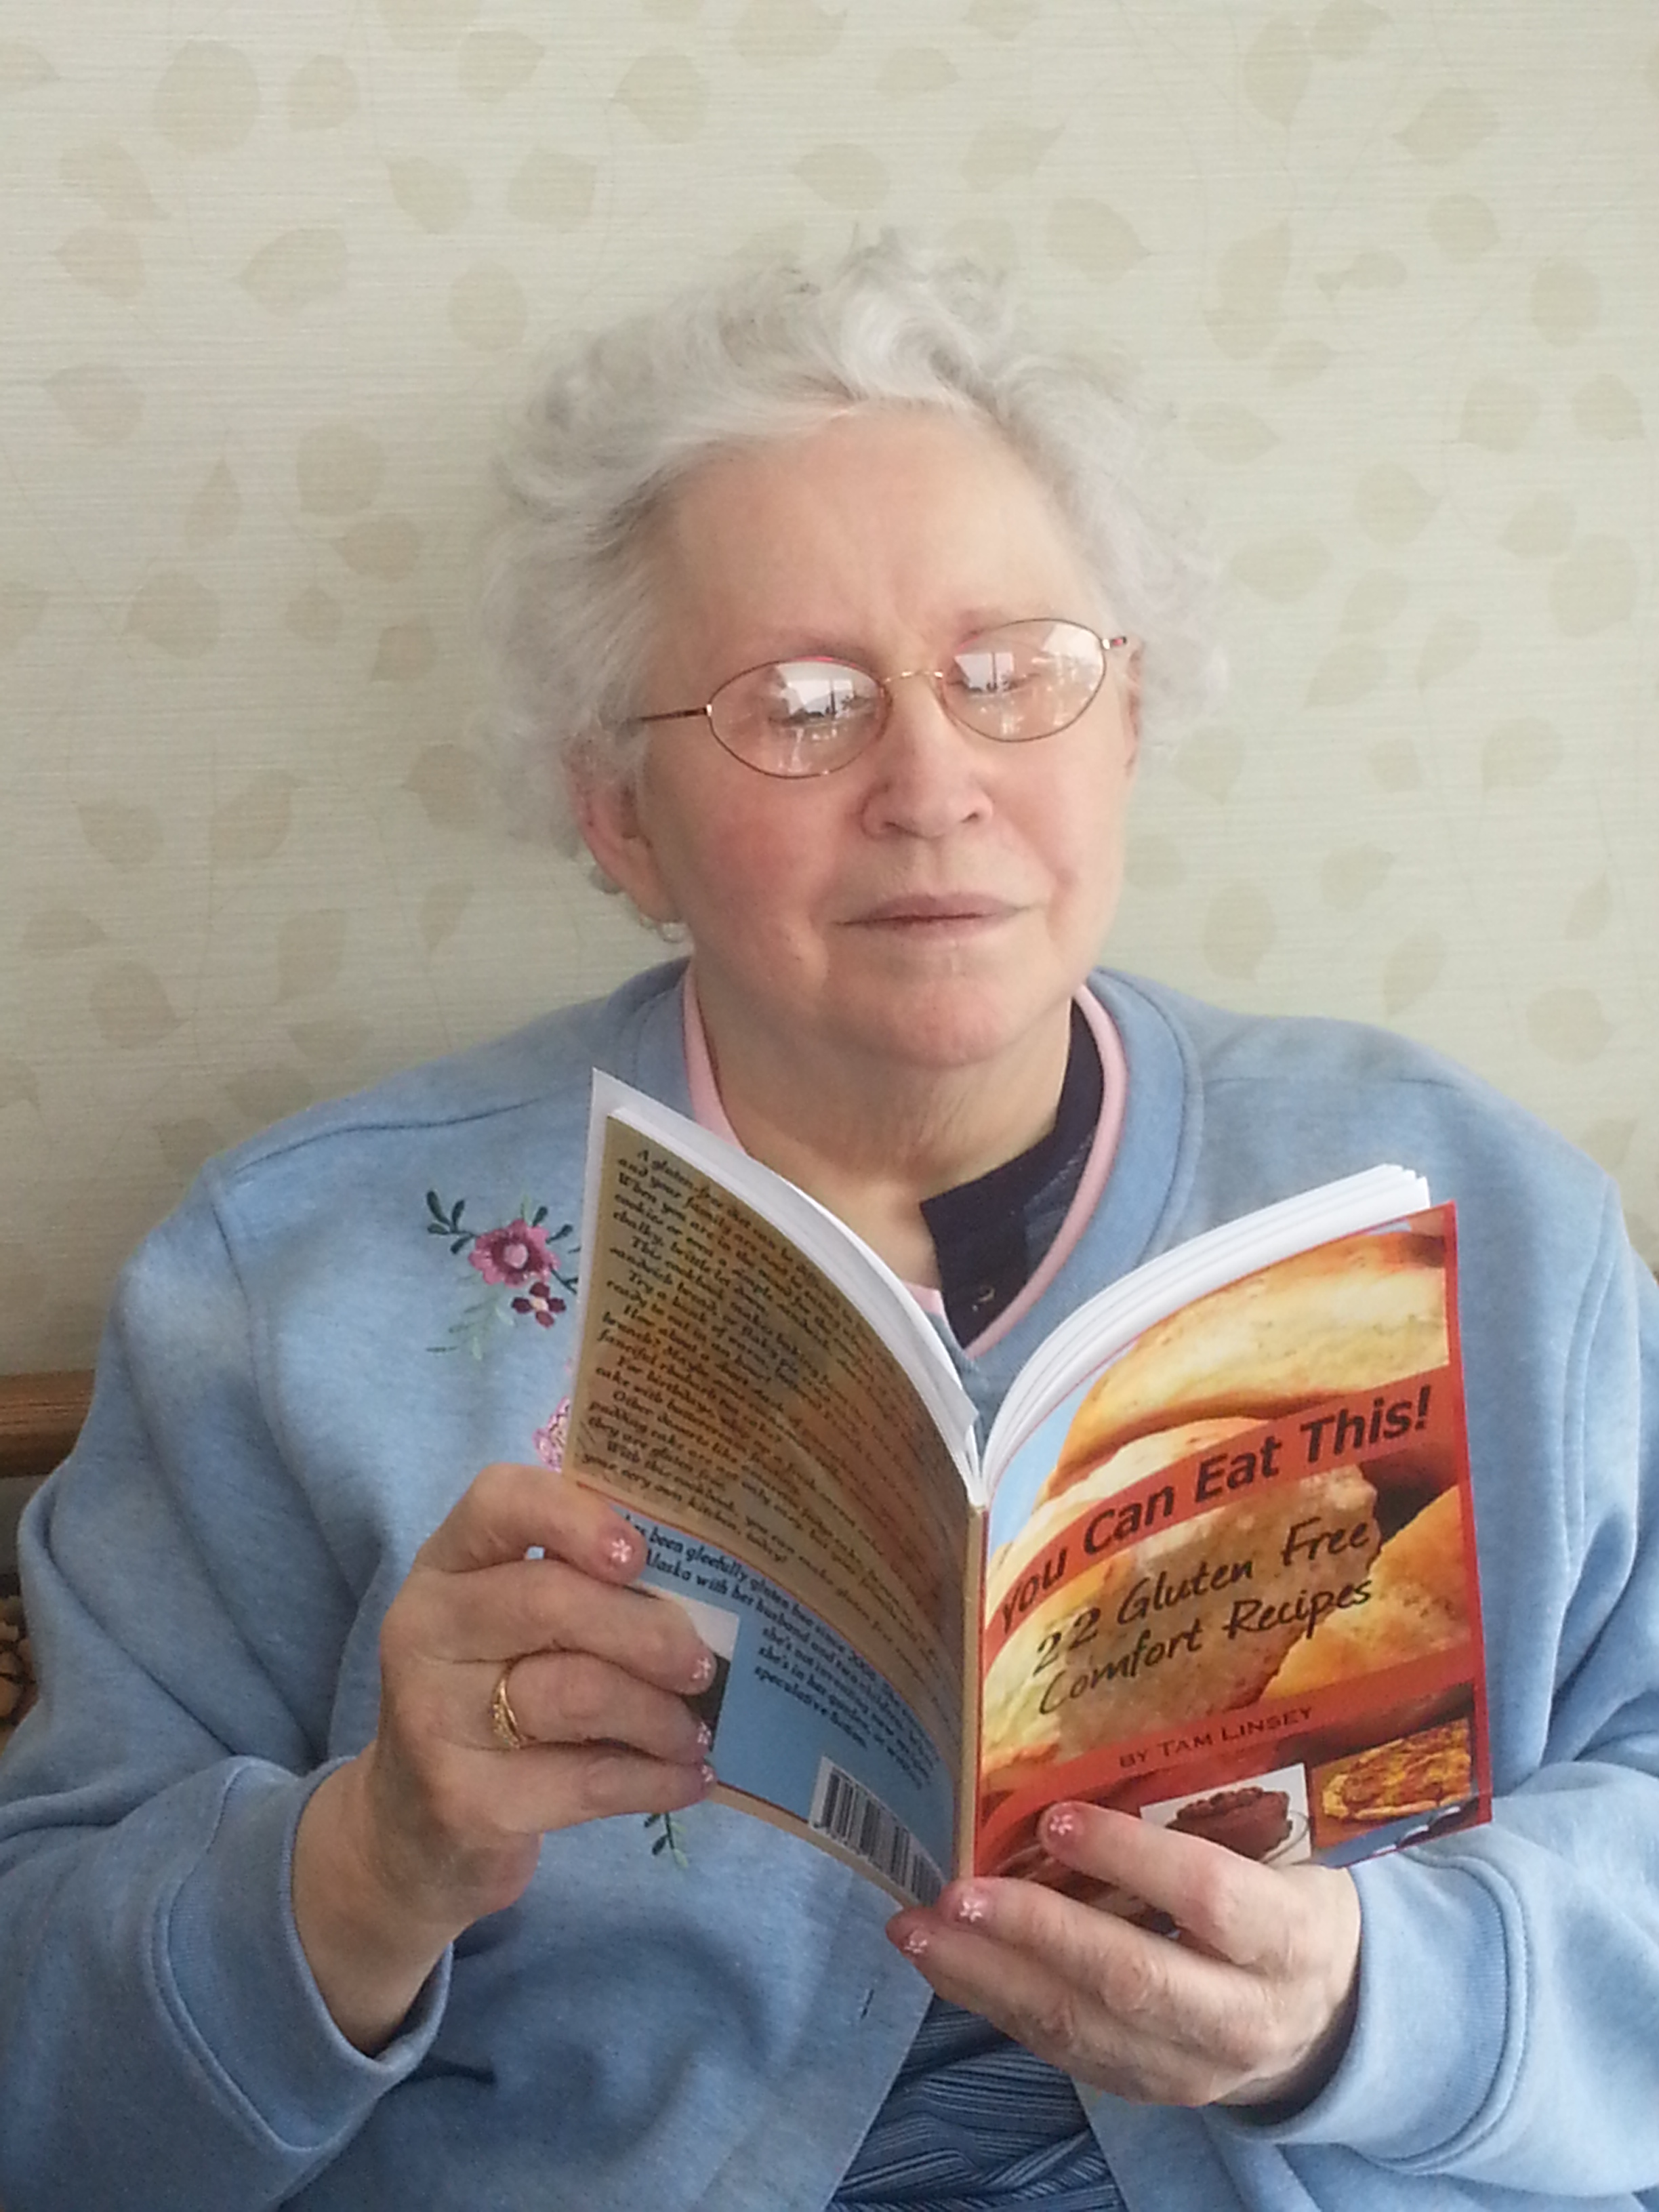 Grandma S Cooking